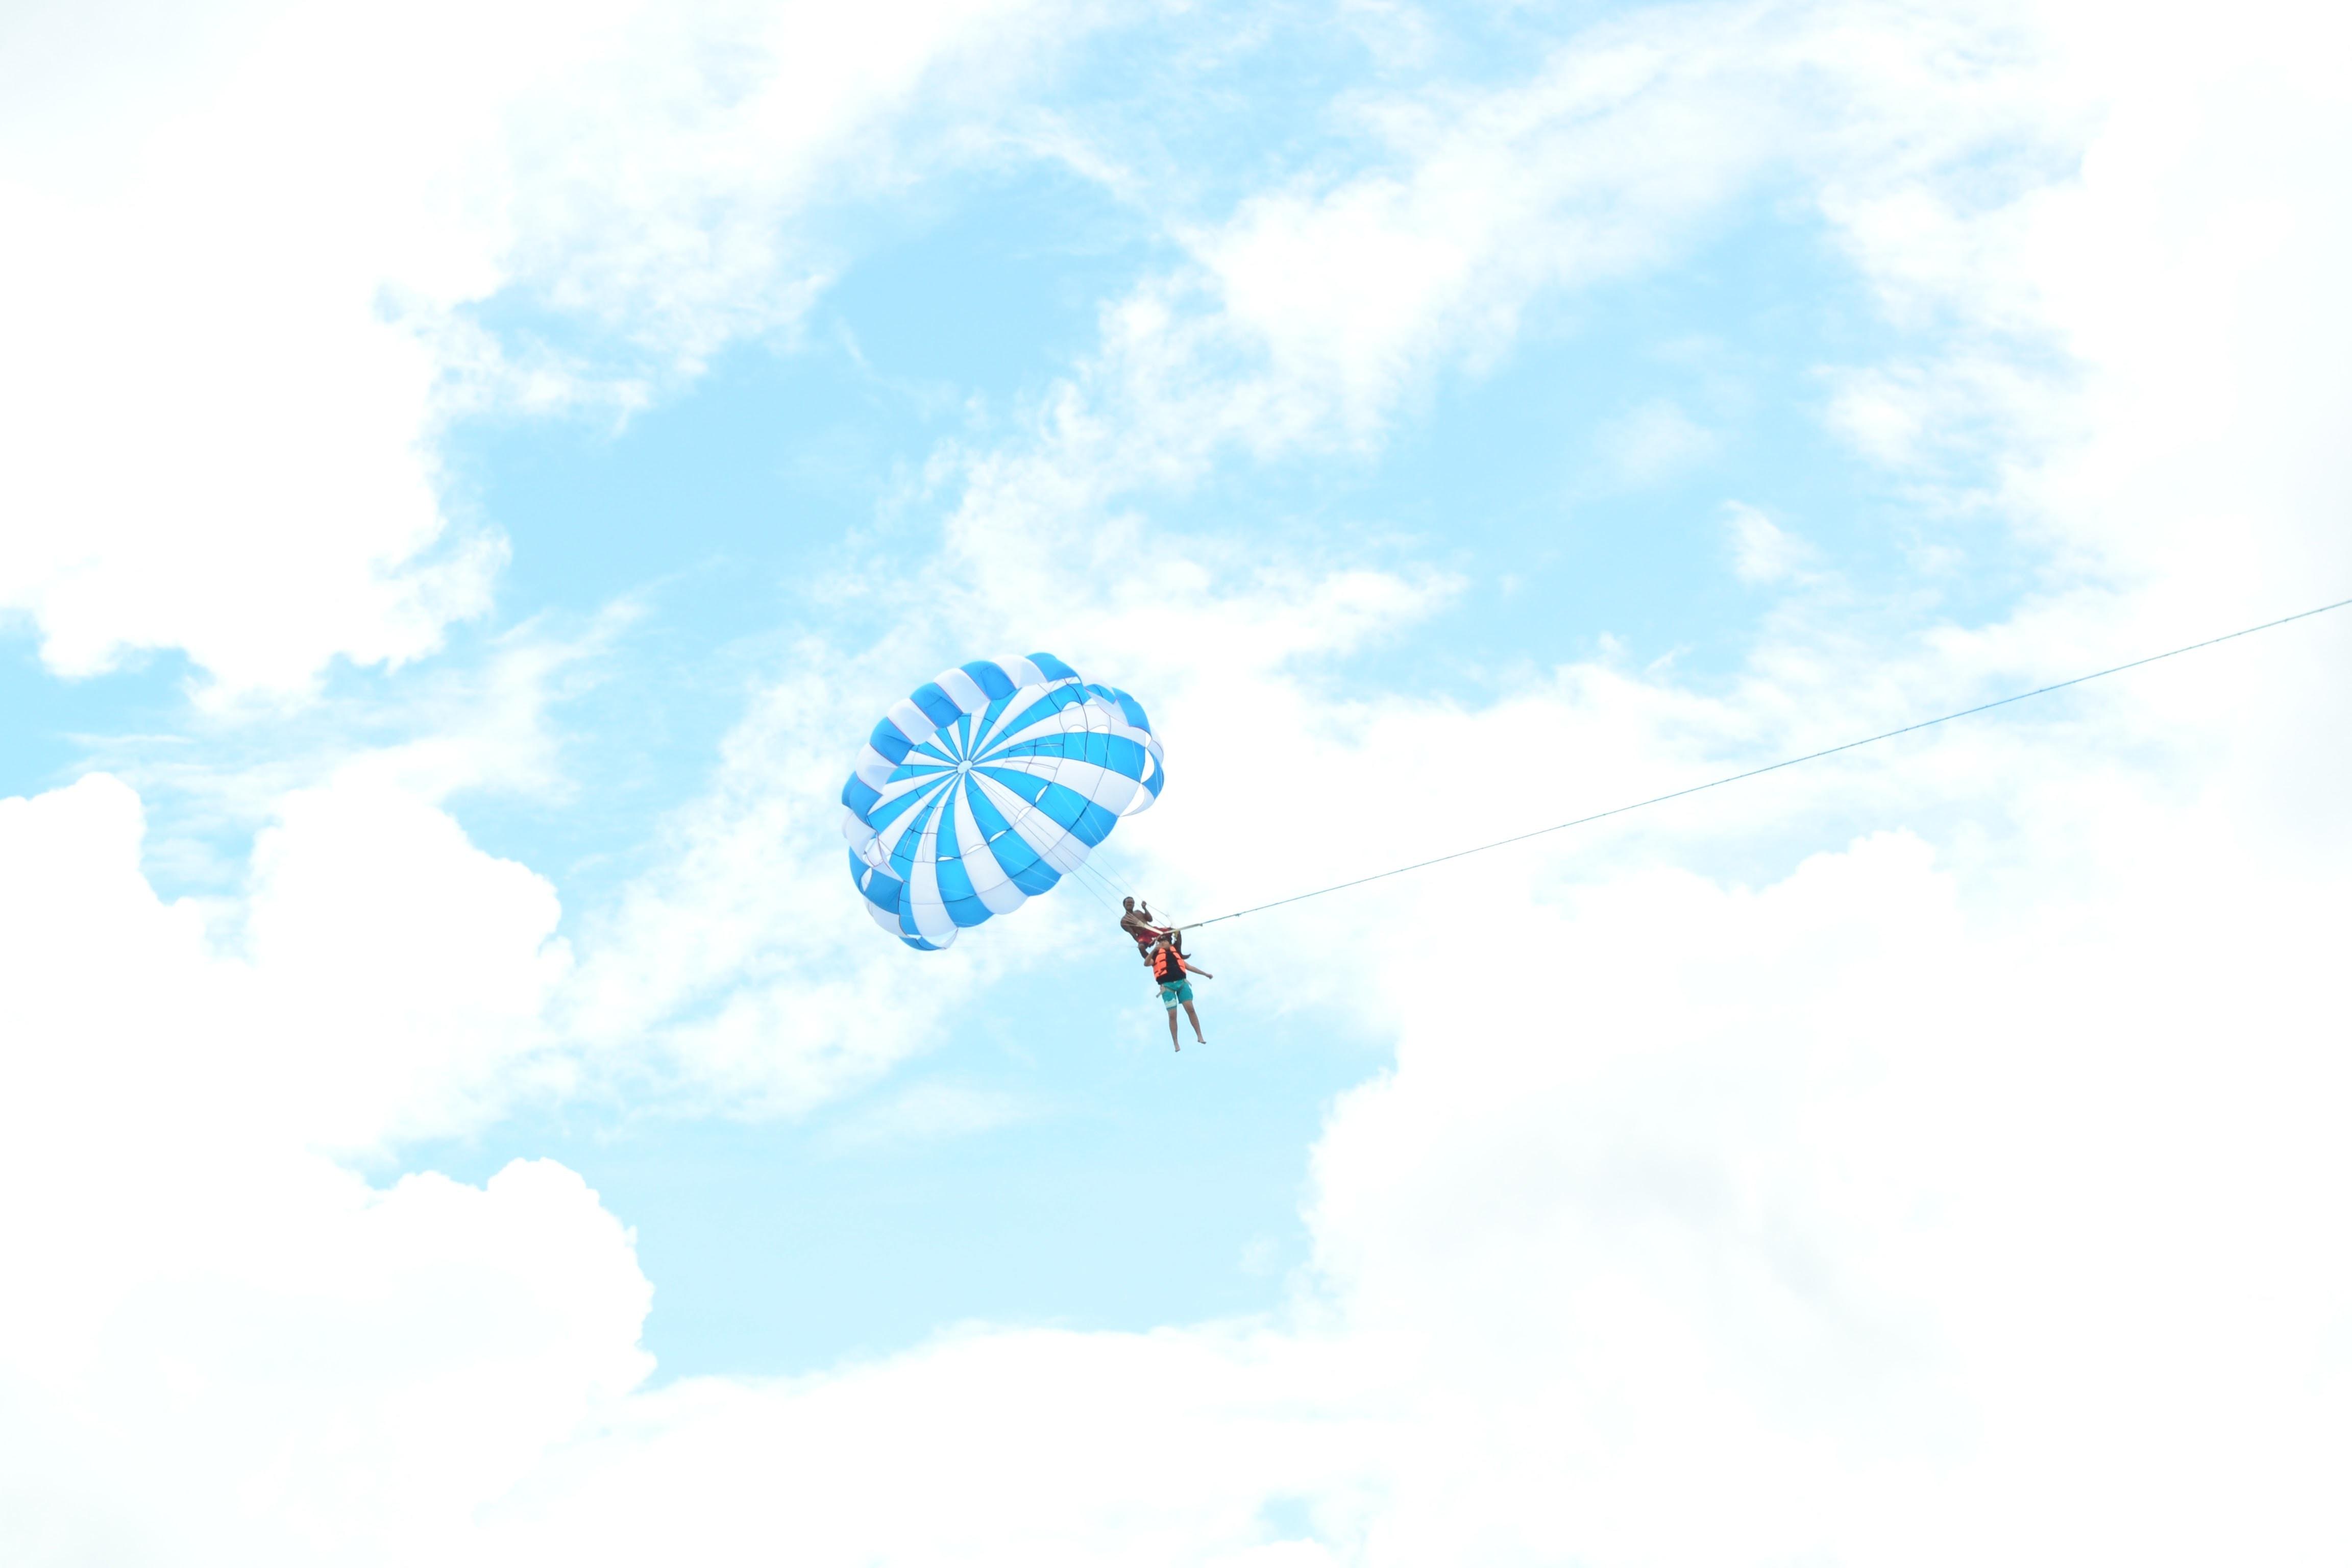 person riding on blue parachute